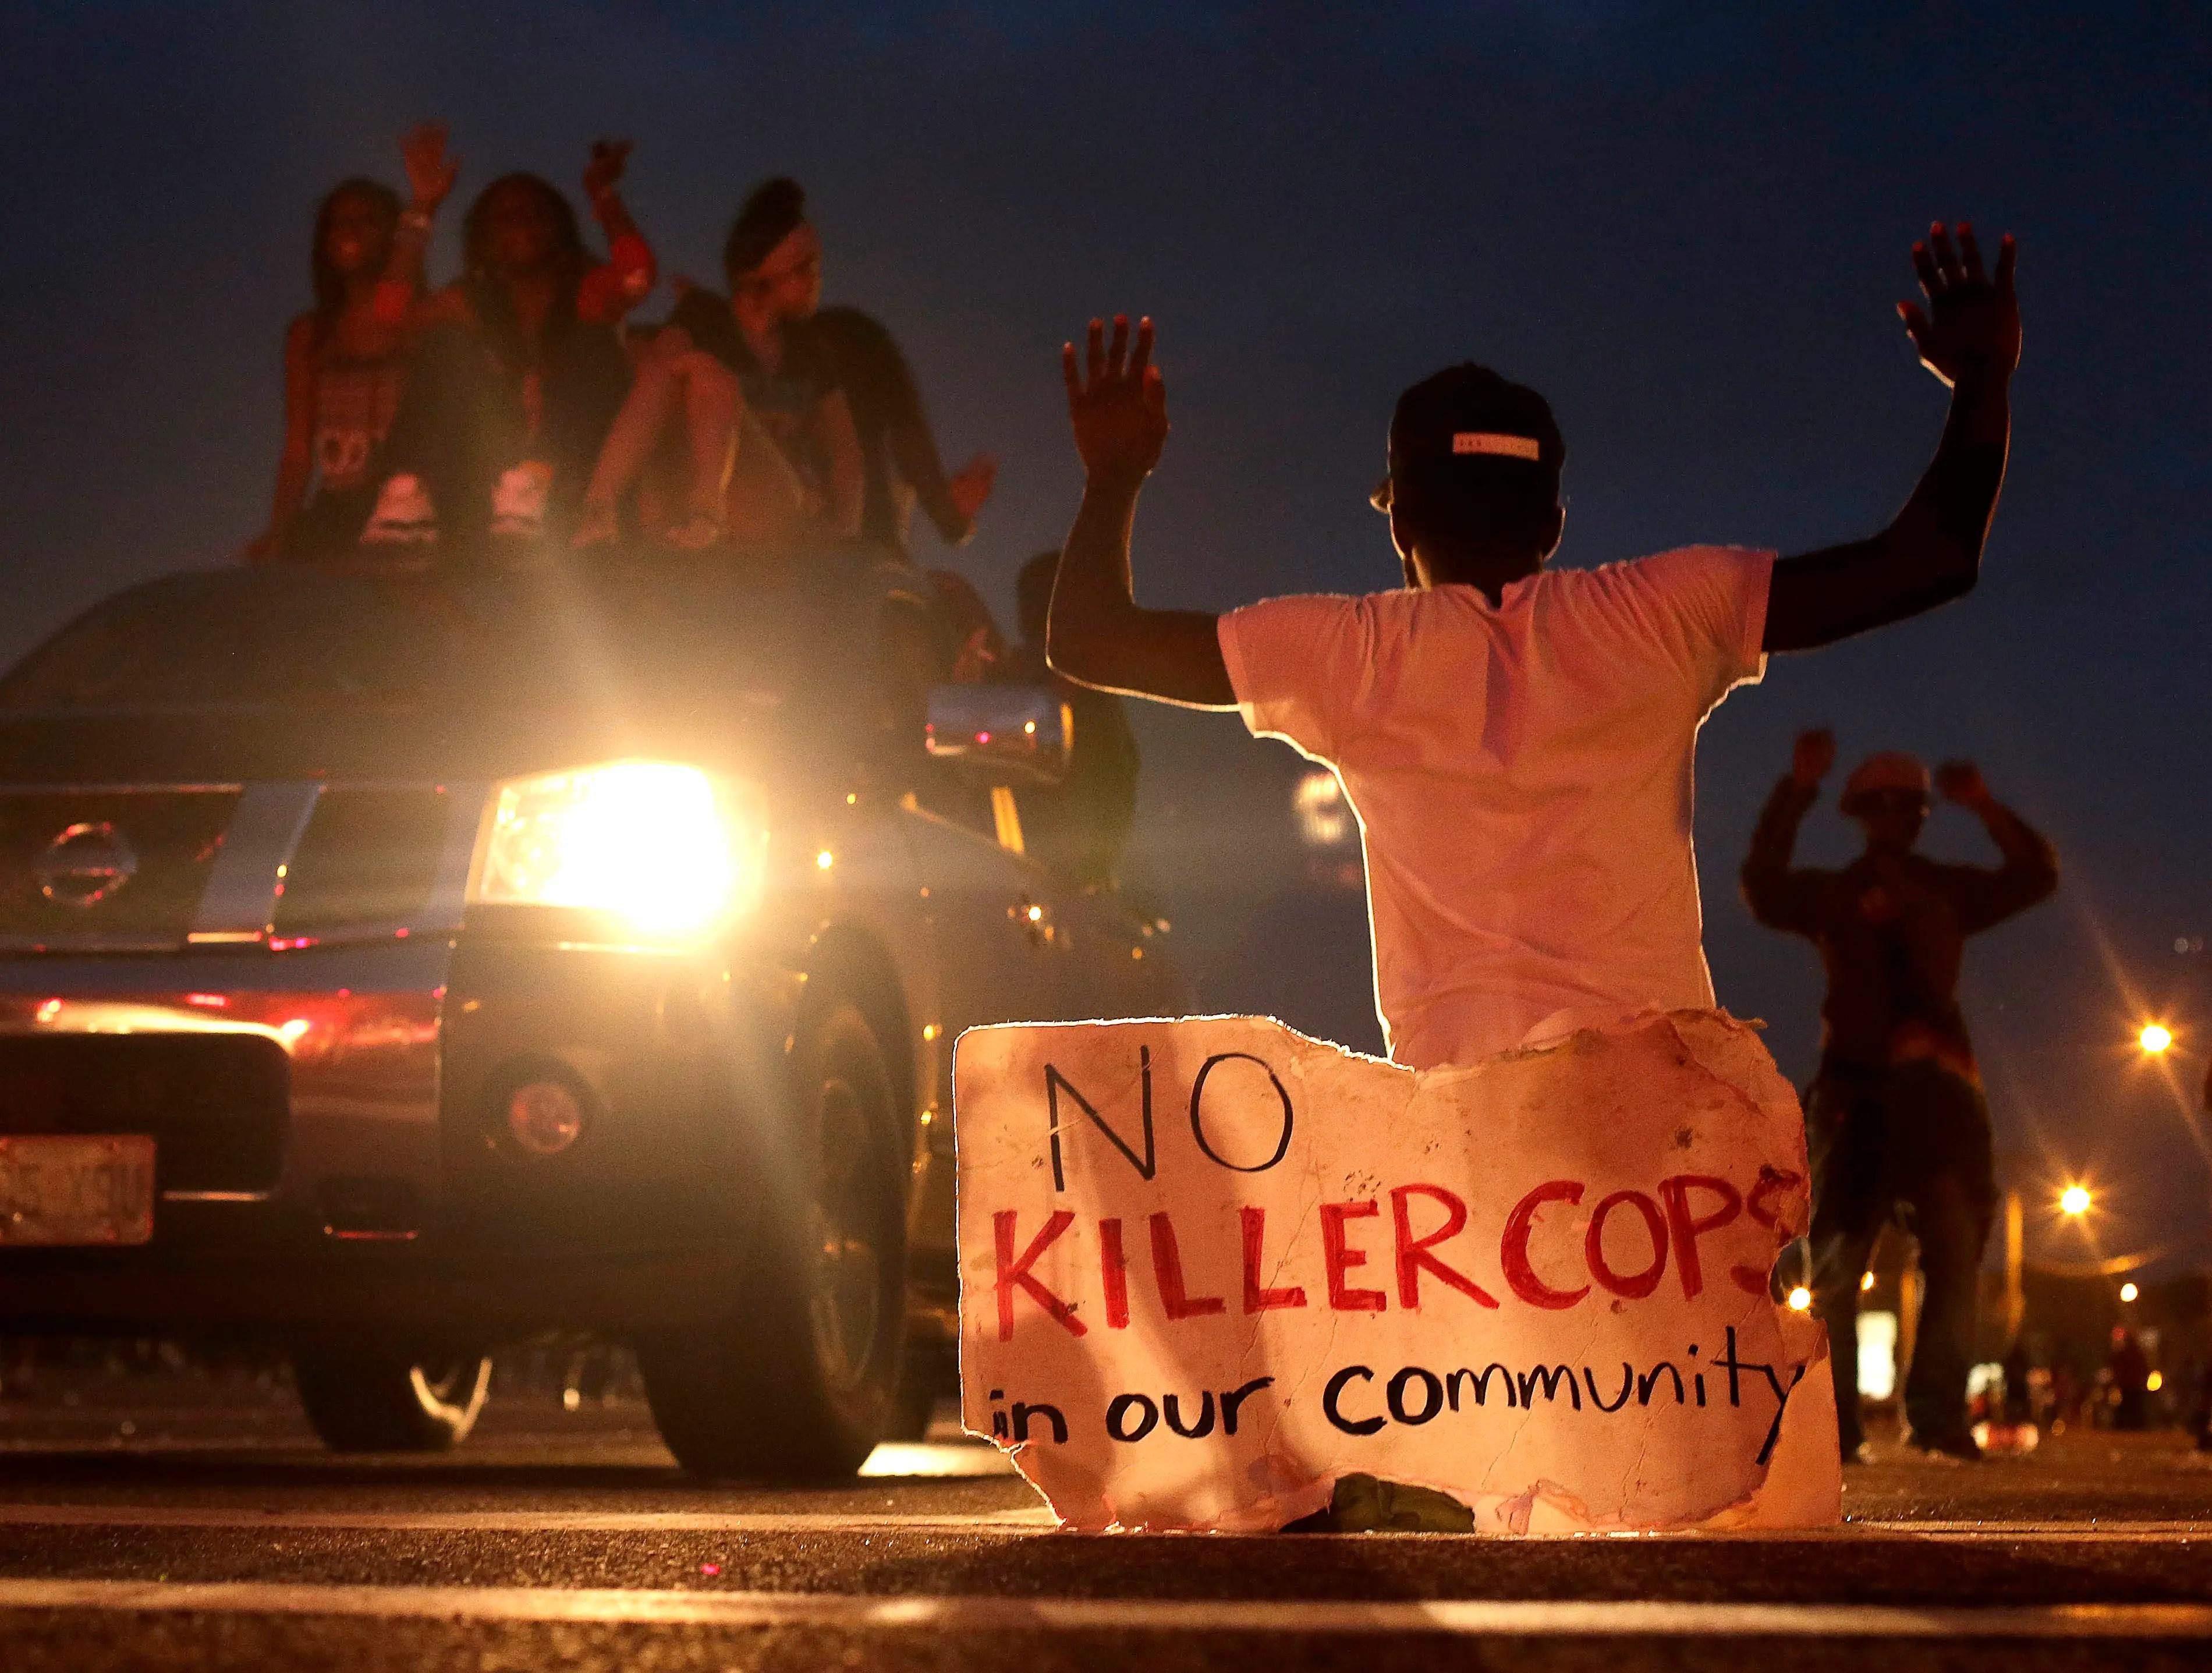 ferguson michael brown police shootings protests